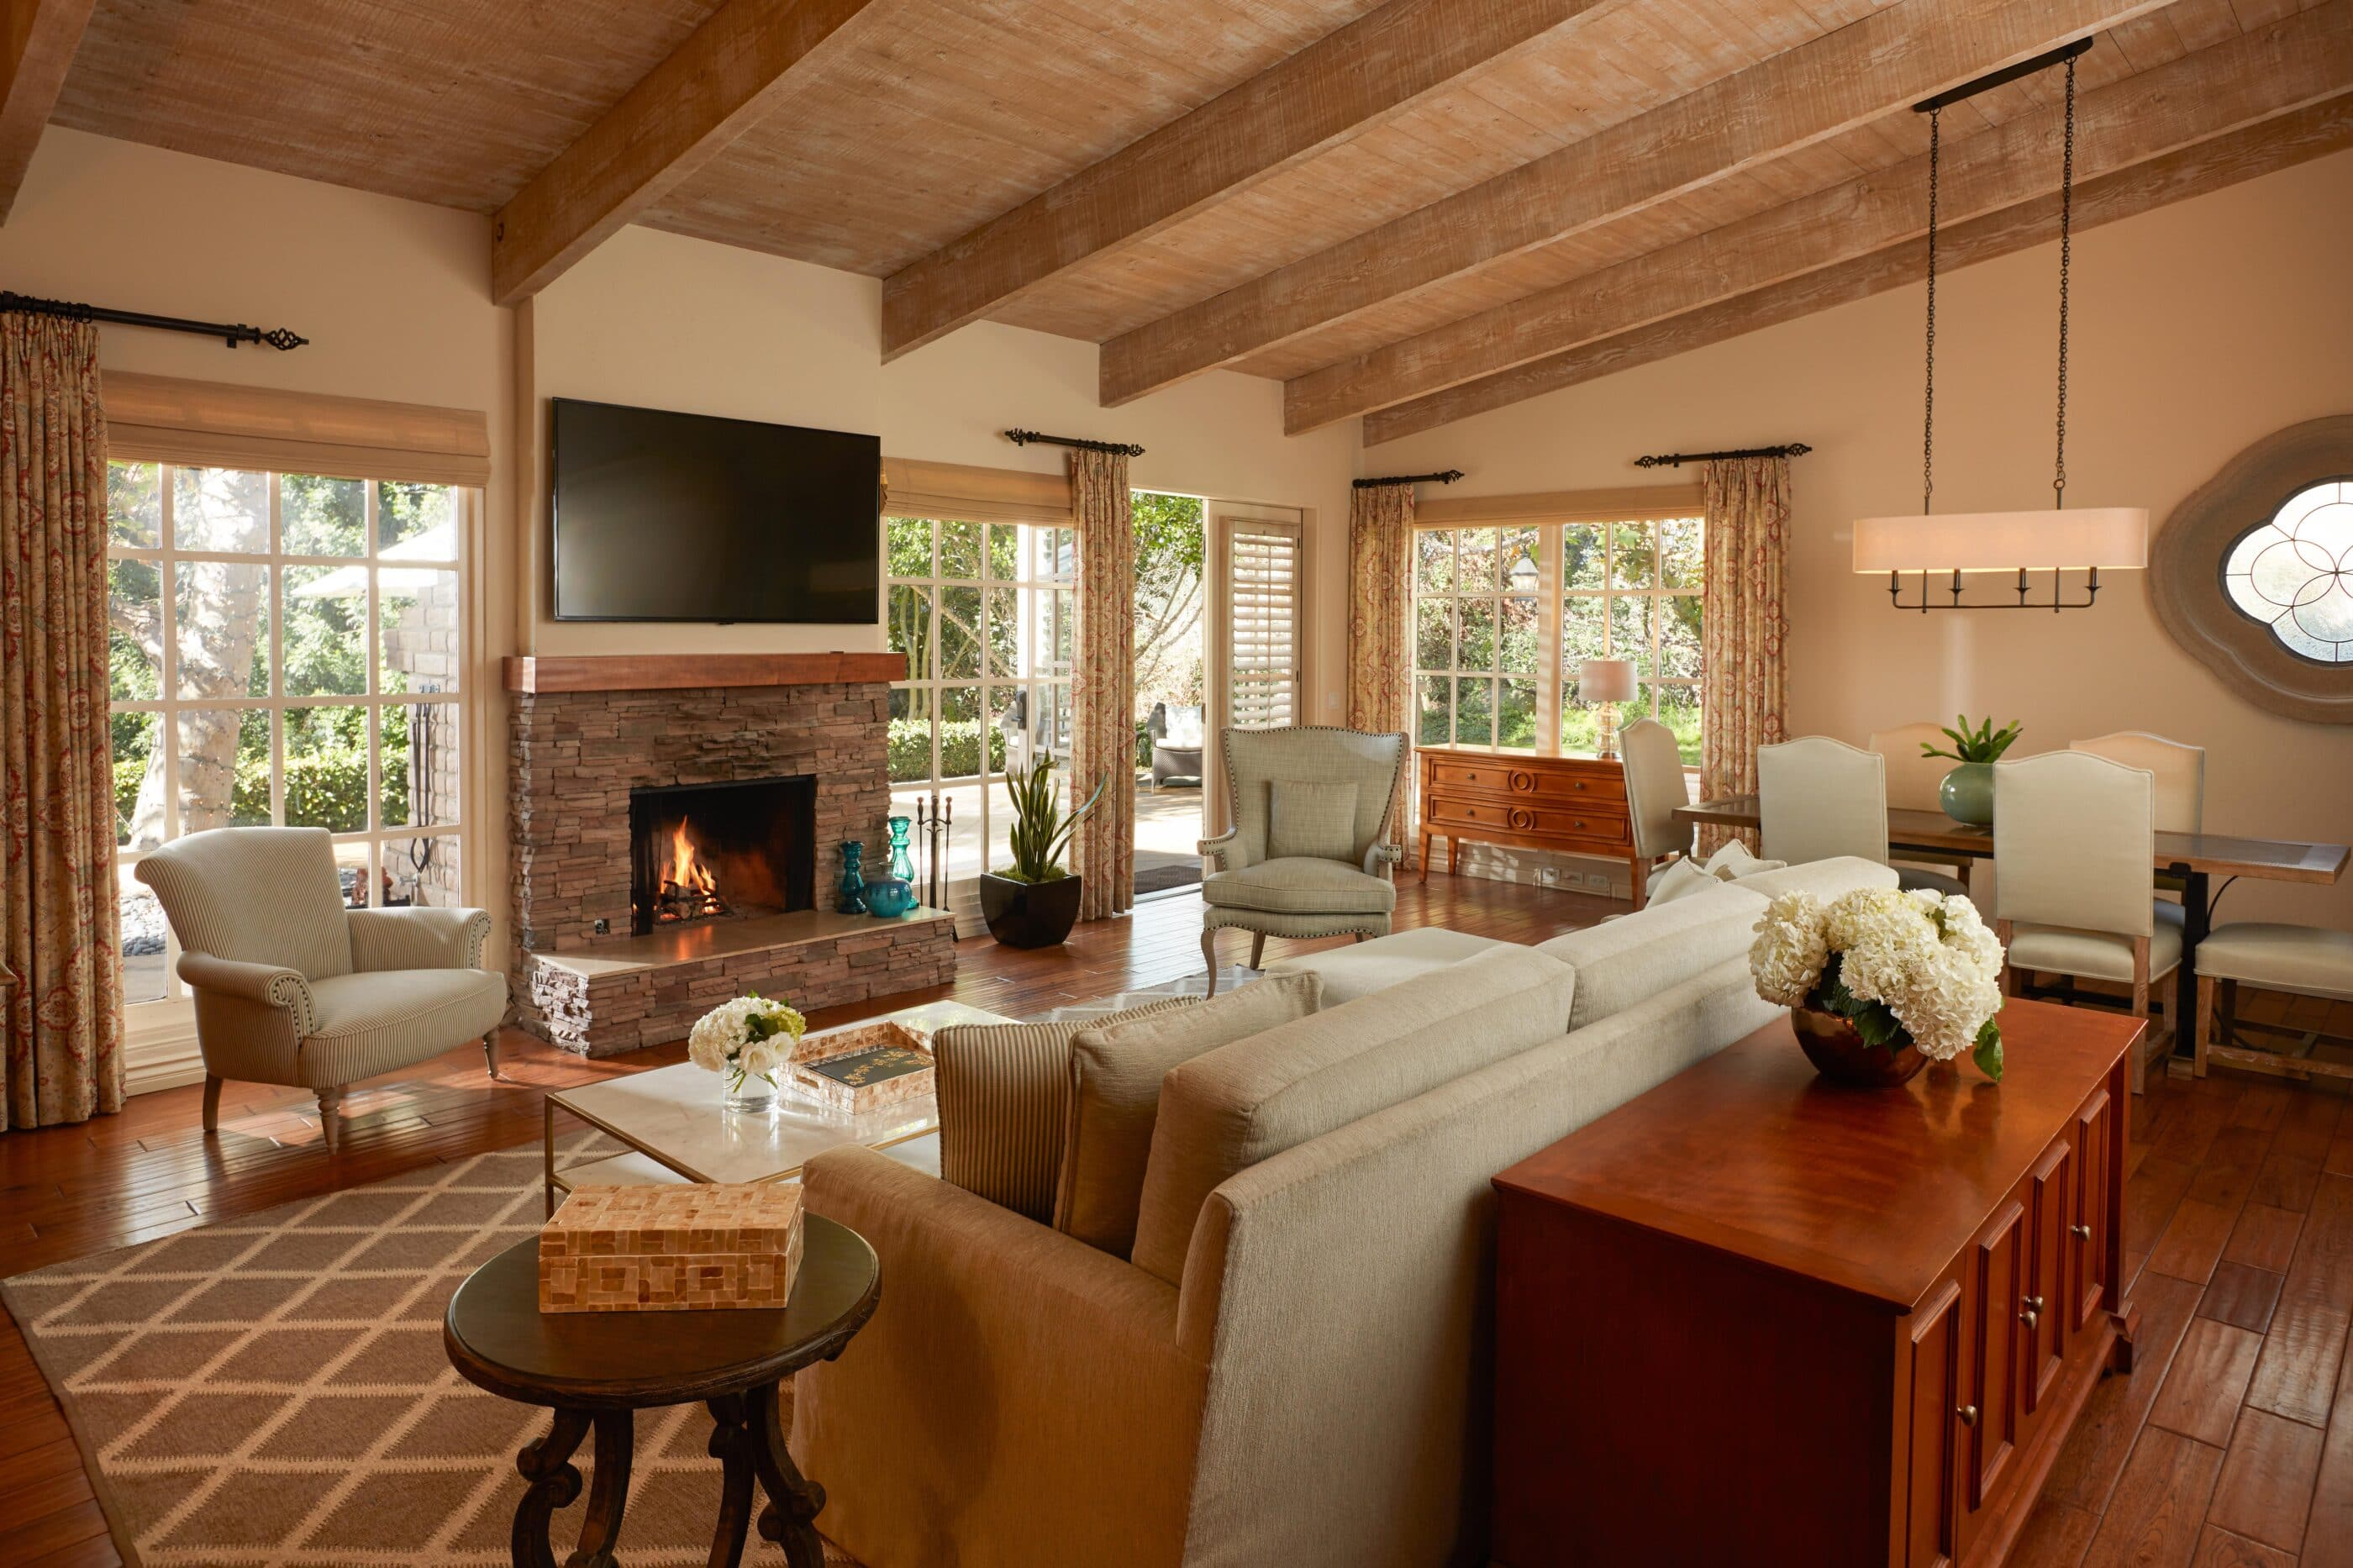 Presidential Suite living room at Rancho Bernardo Inn